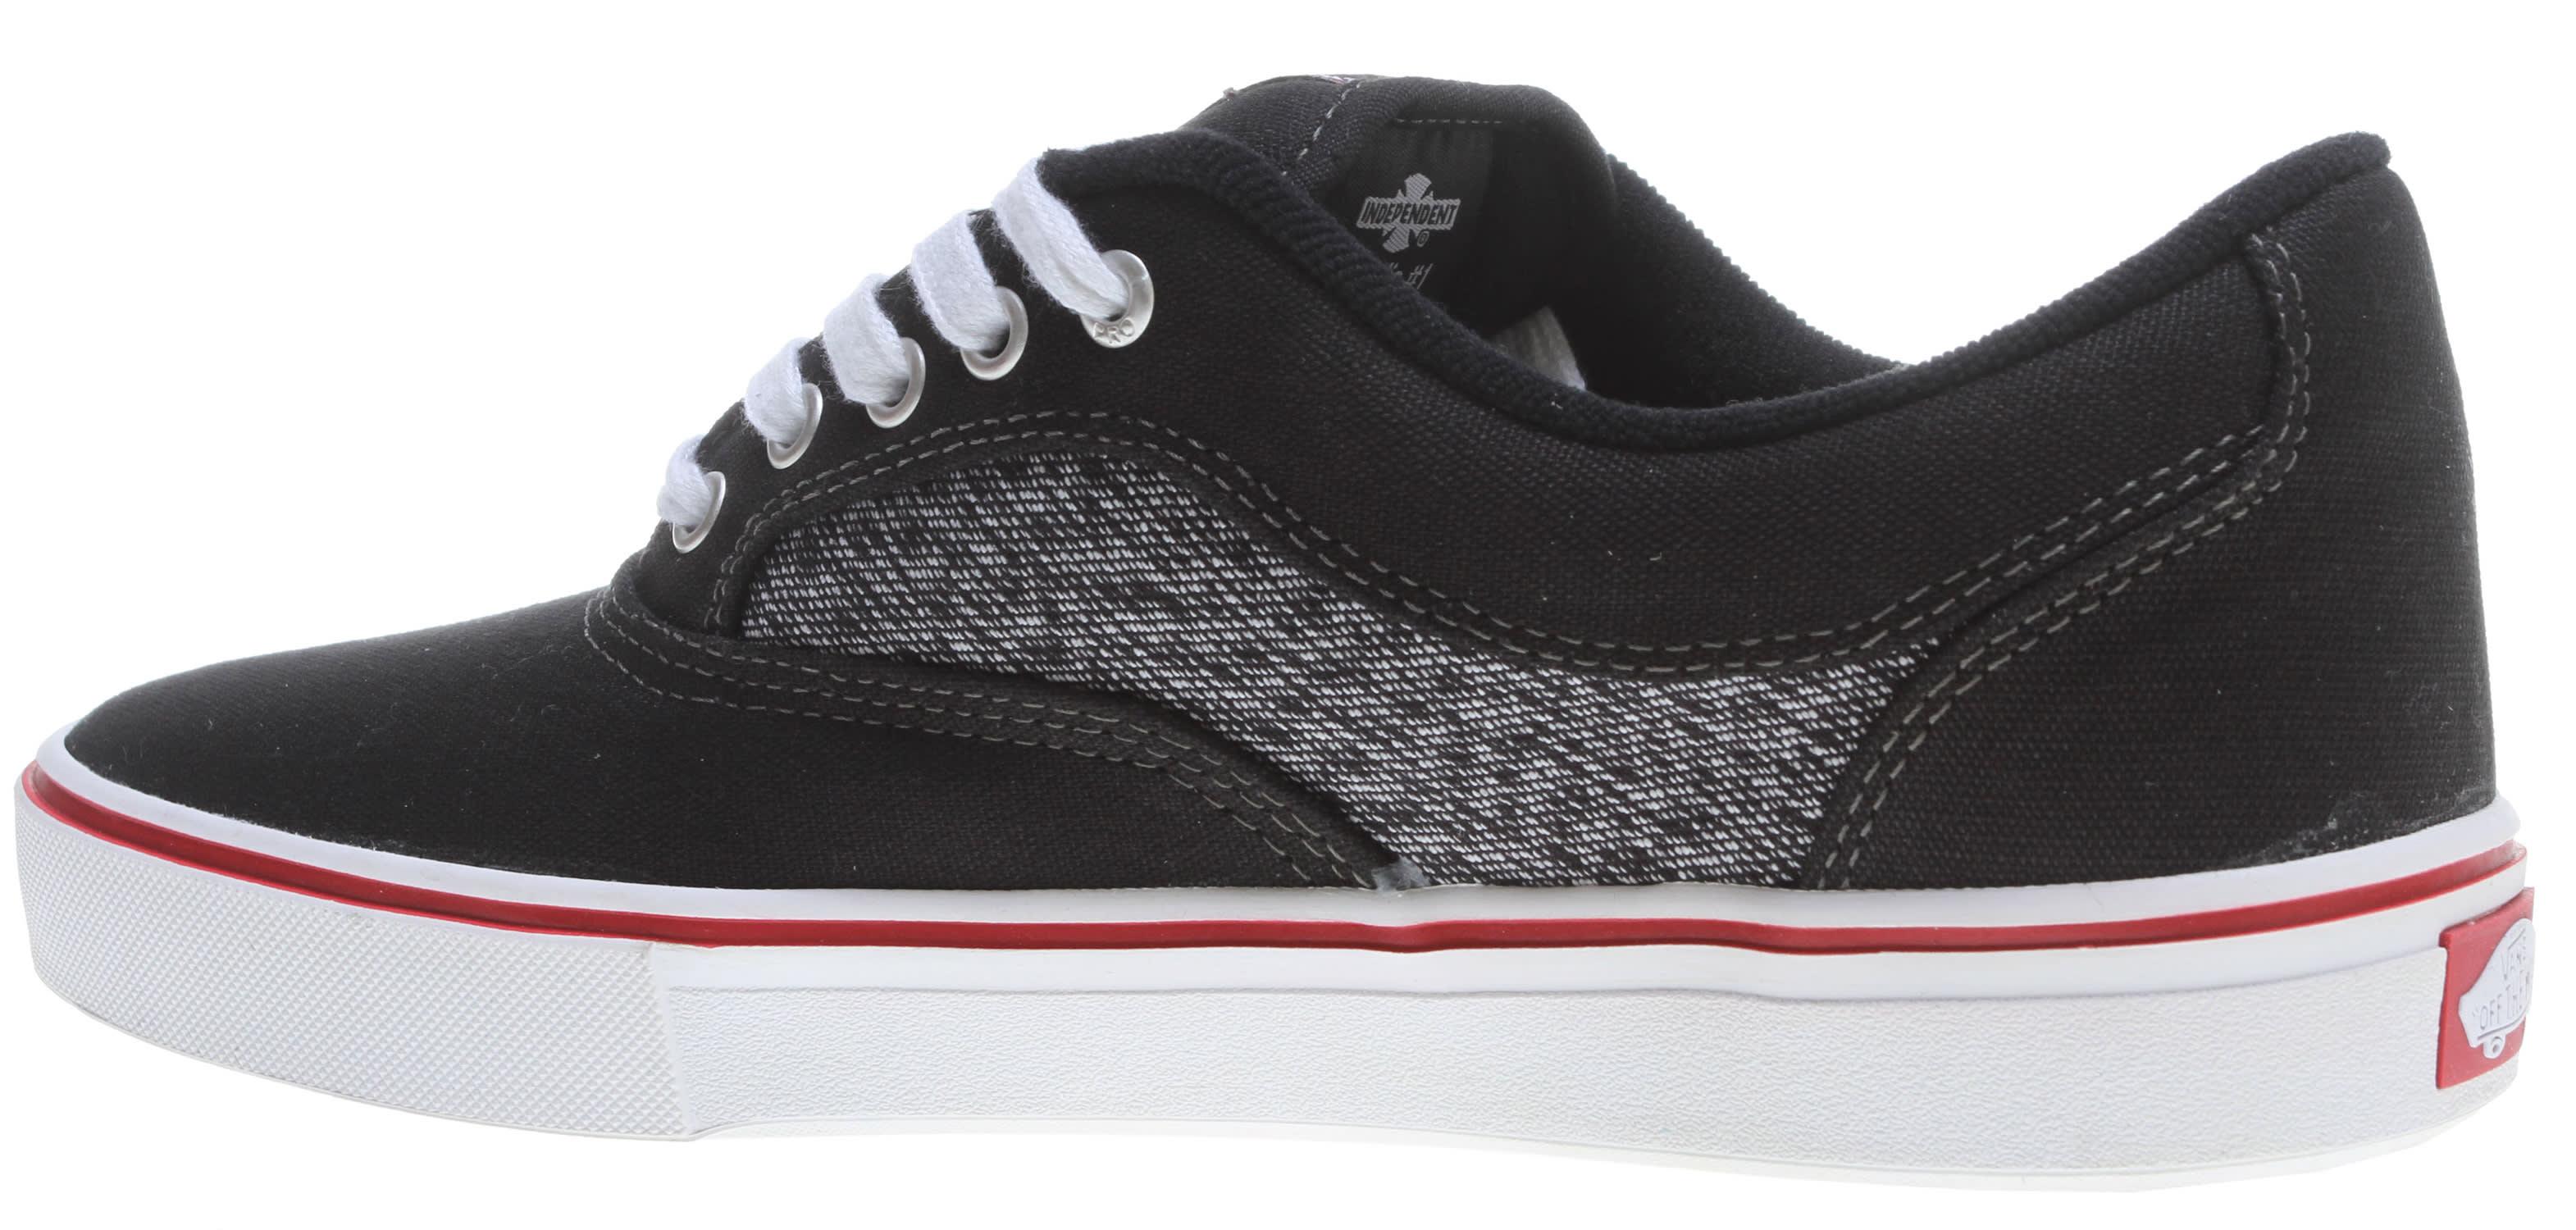 91ecd77c47 Vans Mirada Skate Shoes - thumbnail 3